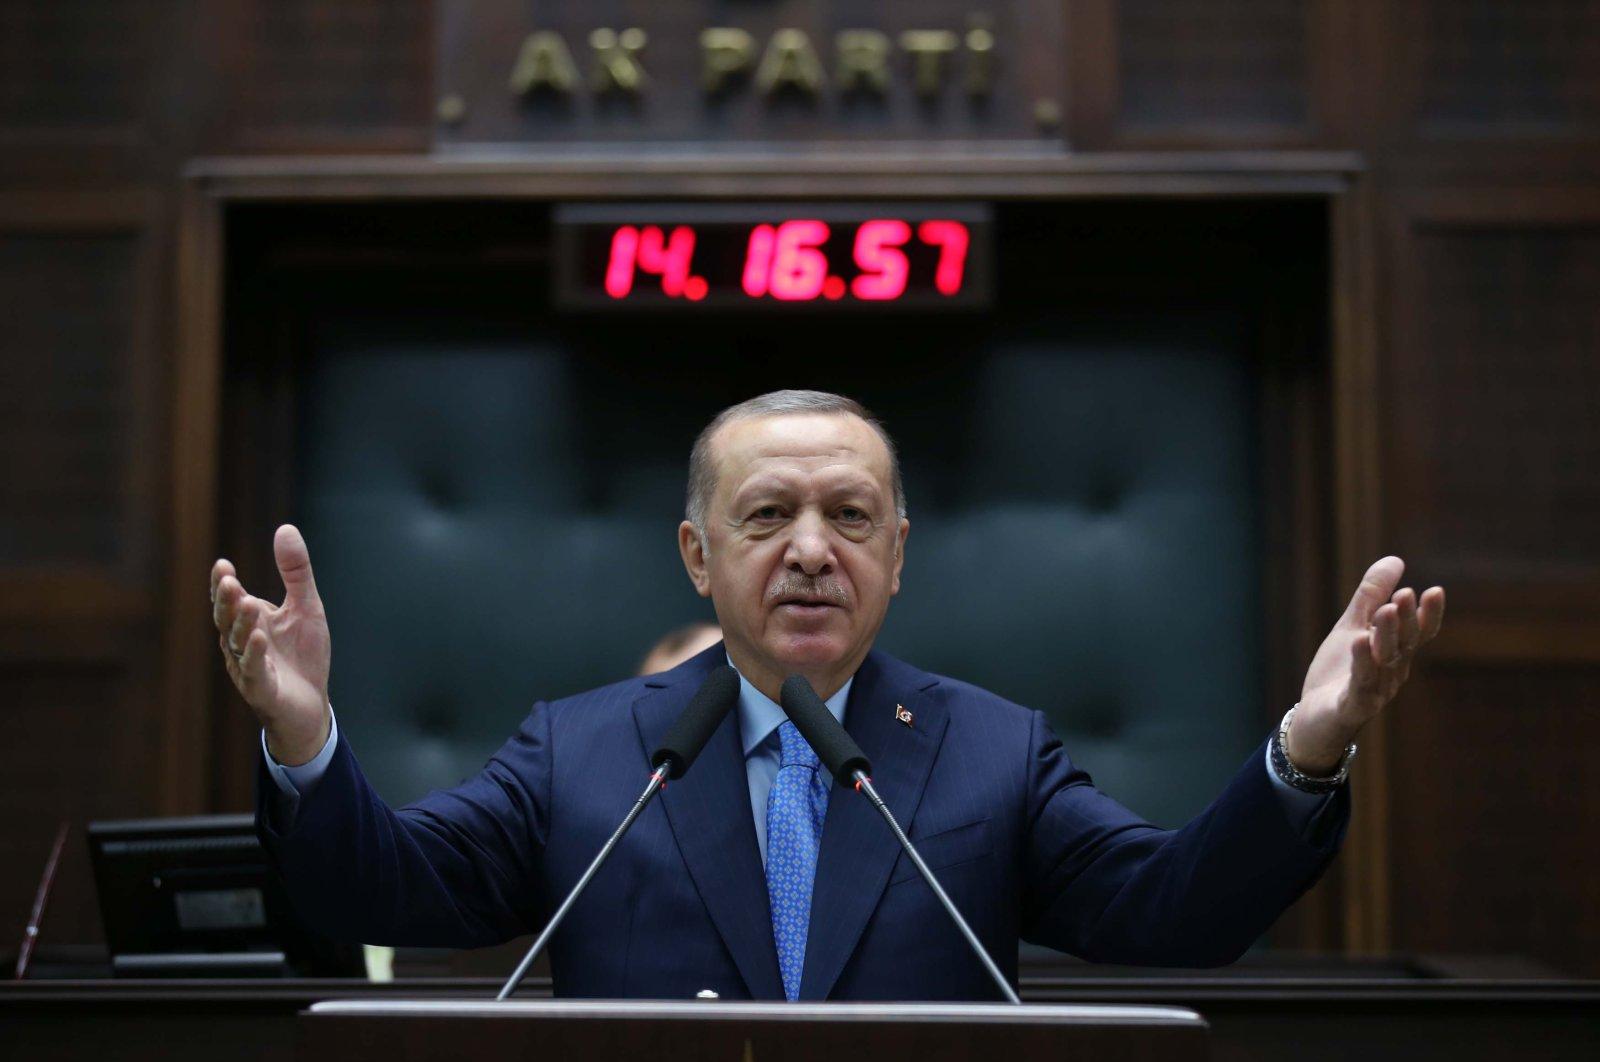 President Recep Tayyip Erdoğan addresses his fellow party members at AK Party's parliamentary group meeting in the capital Ankara, Nov. 11, 2020. (DHA)